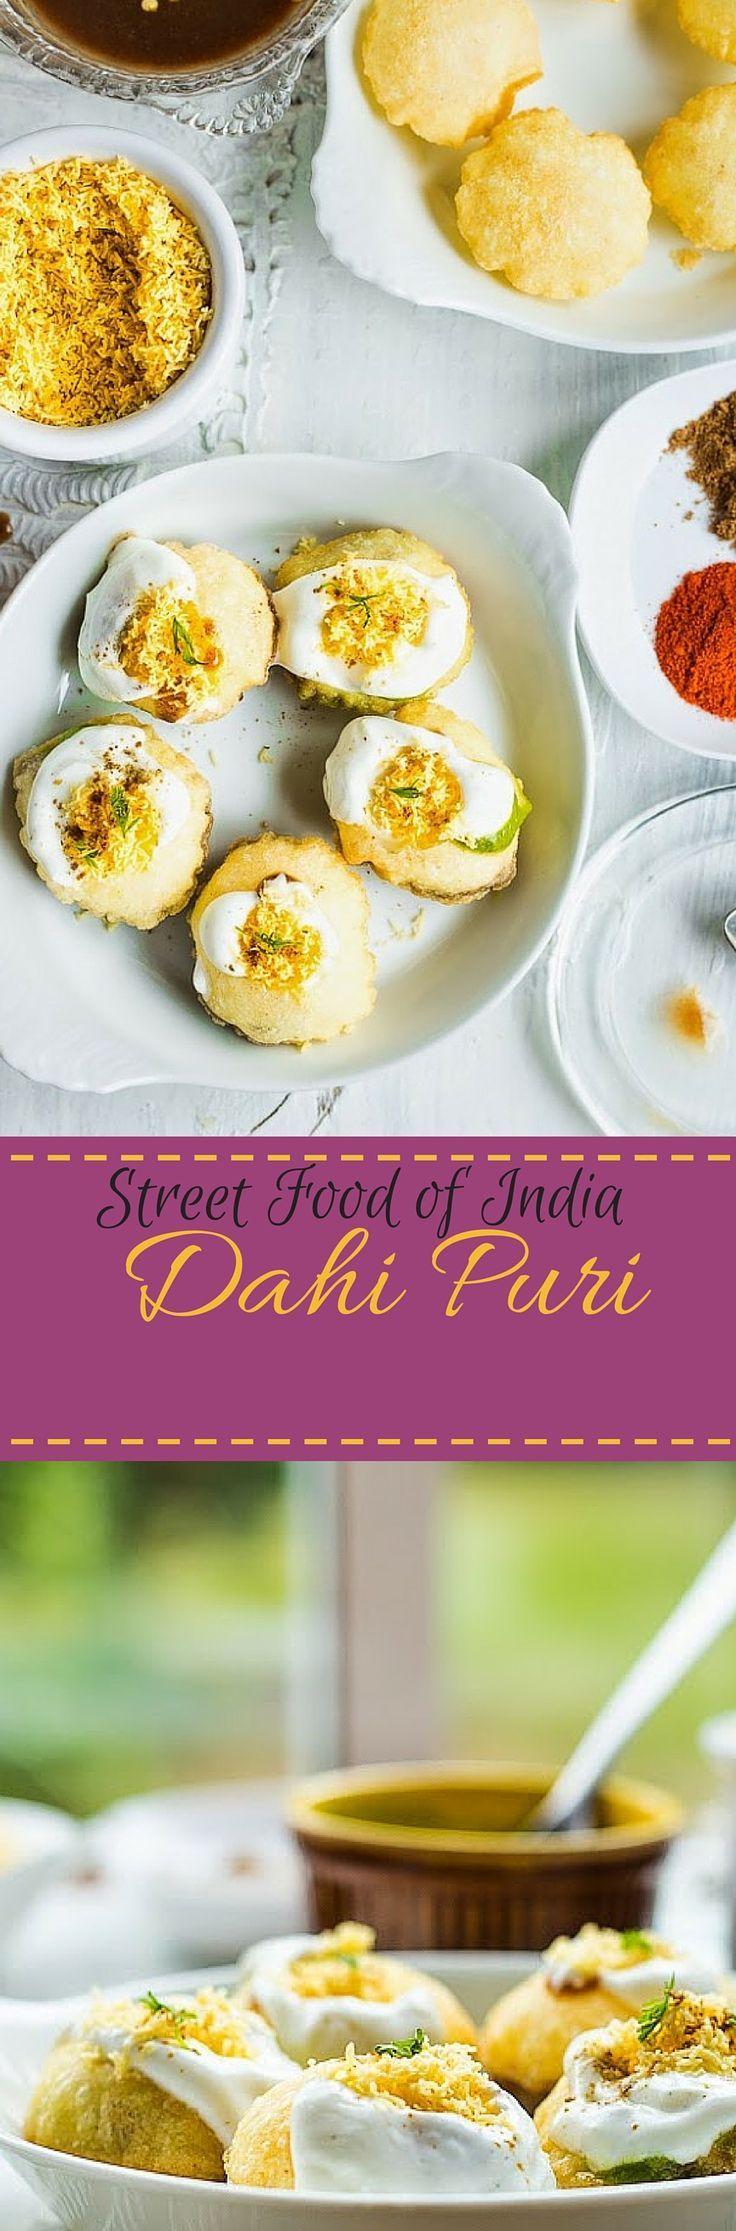 16 best street food images on pinterest indian snacks indian indian street food forumfinder Images